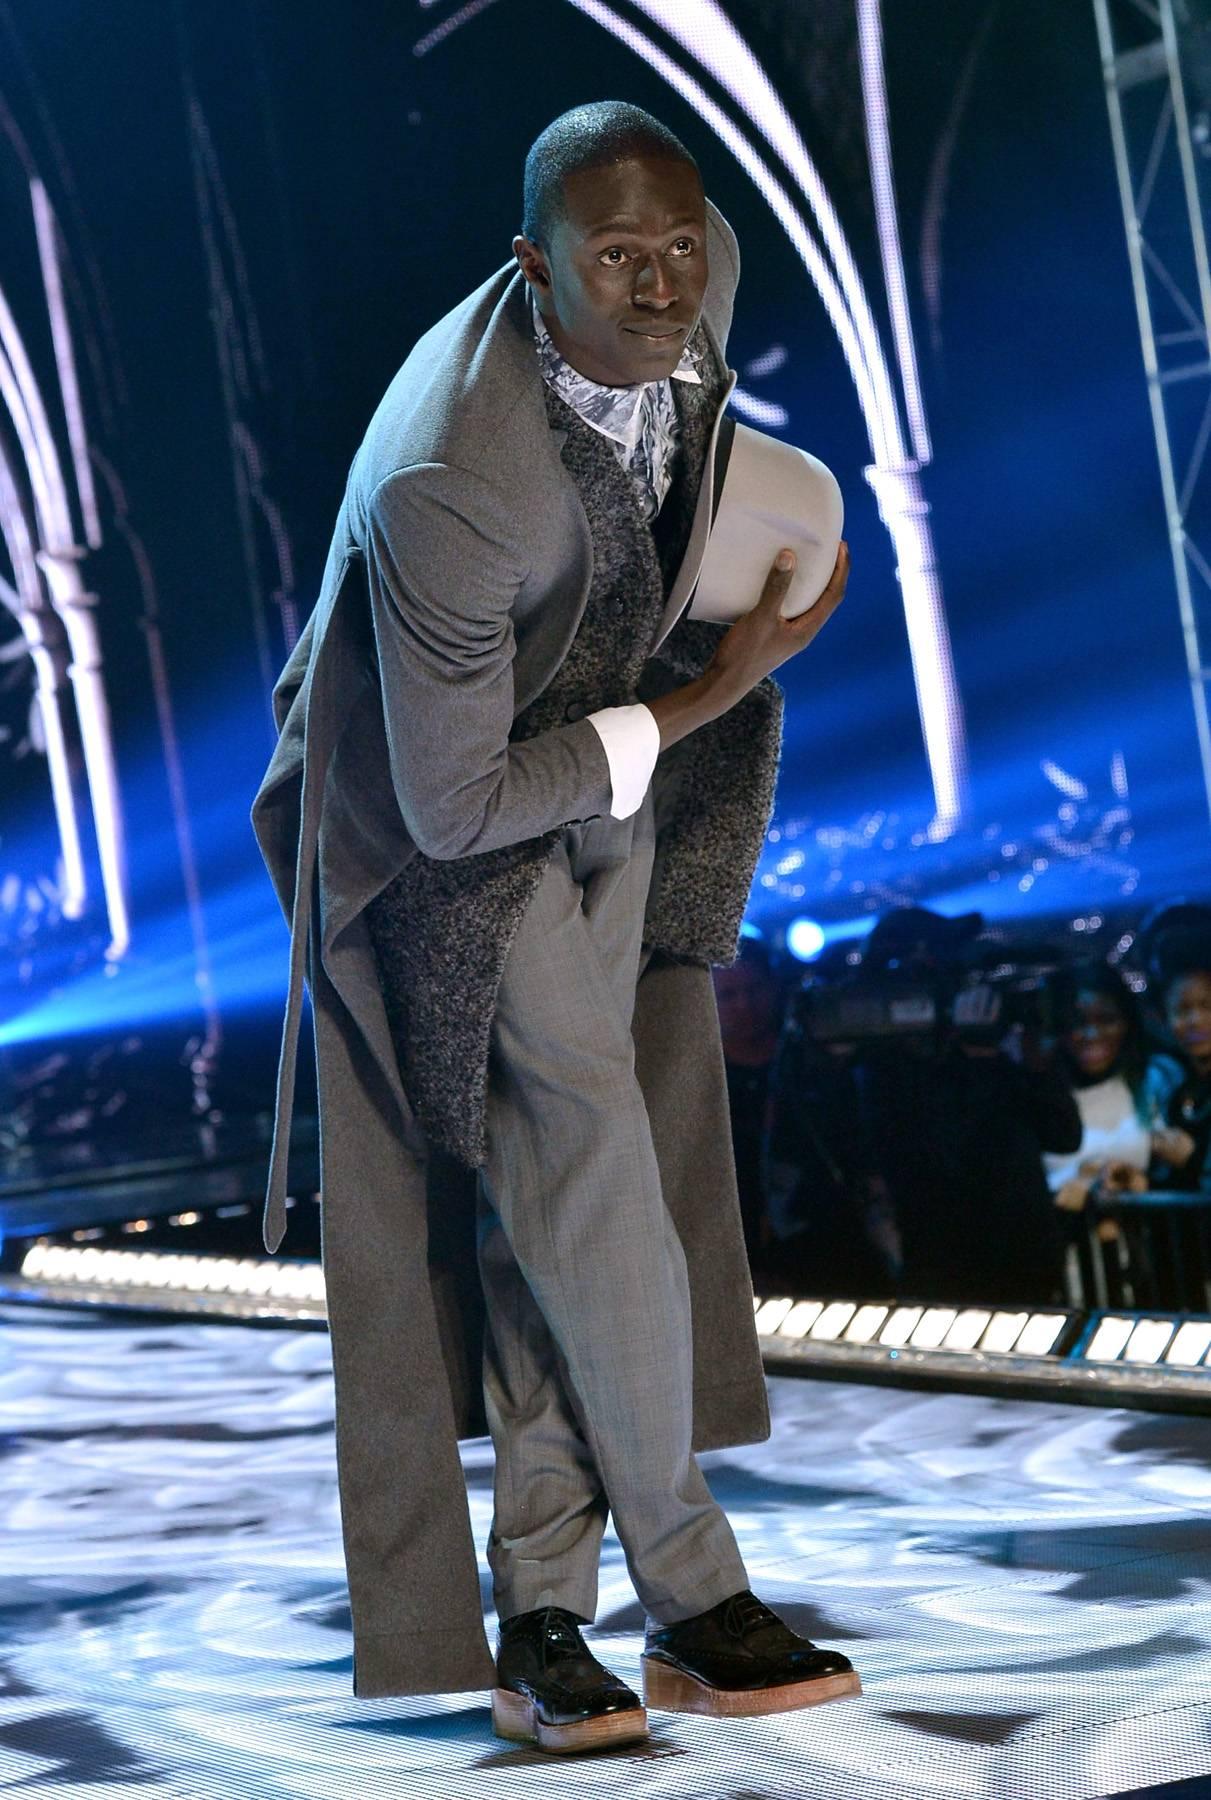 Winston Rathbun - (Photo by Rick Diamond/Getty Images for BET)